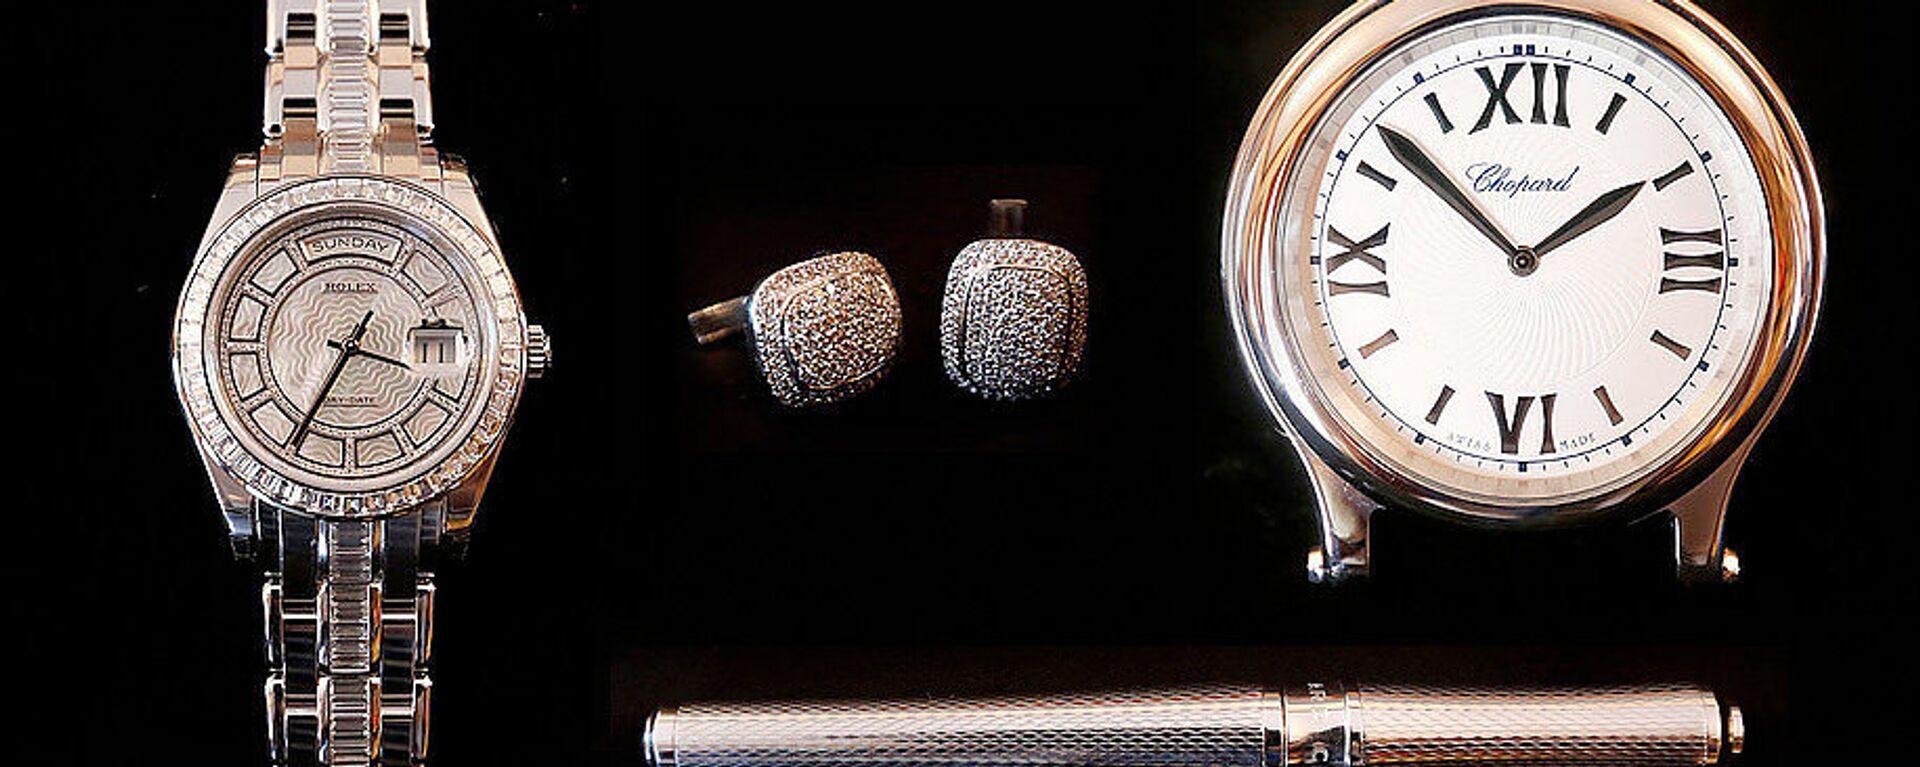 Set de joyas personales de Oro Blanco, Platino y Acero - Sputnik Mundo, 1920, 27.04.2021